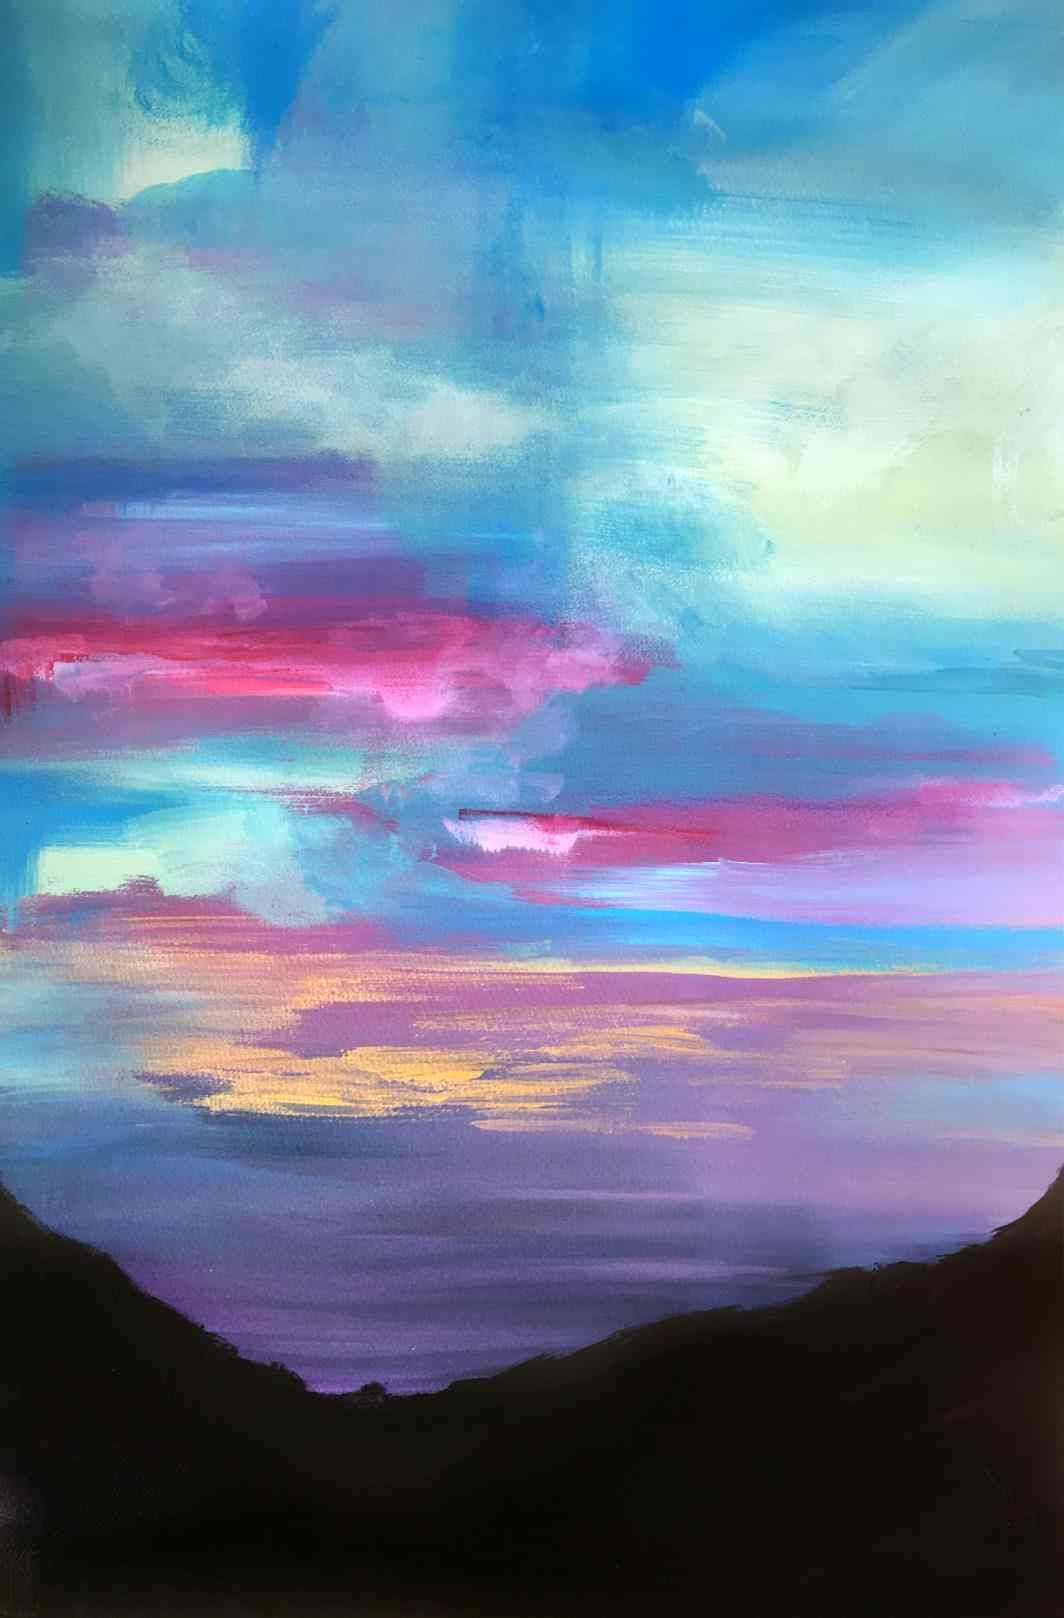 1064x1618 Easy Watercolor Paintings Landscape Hd Wallpaper Ideas Easy